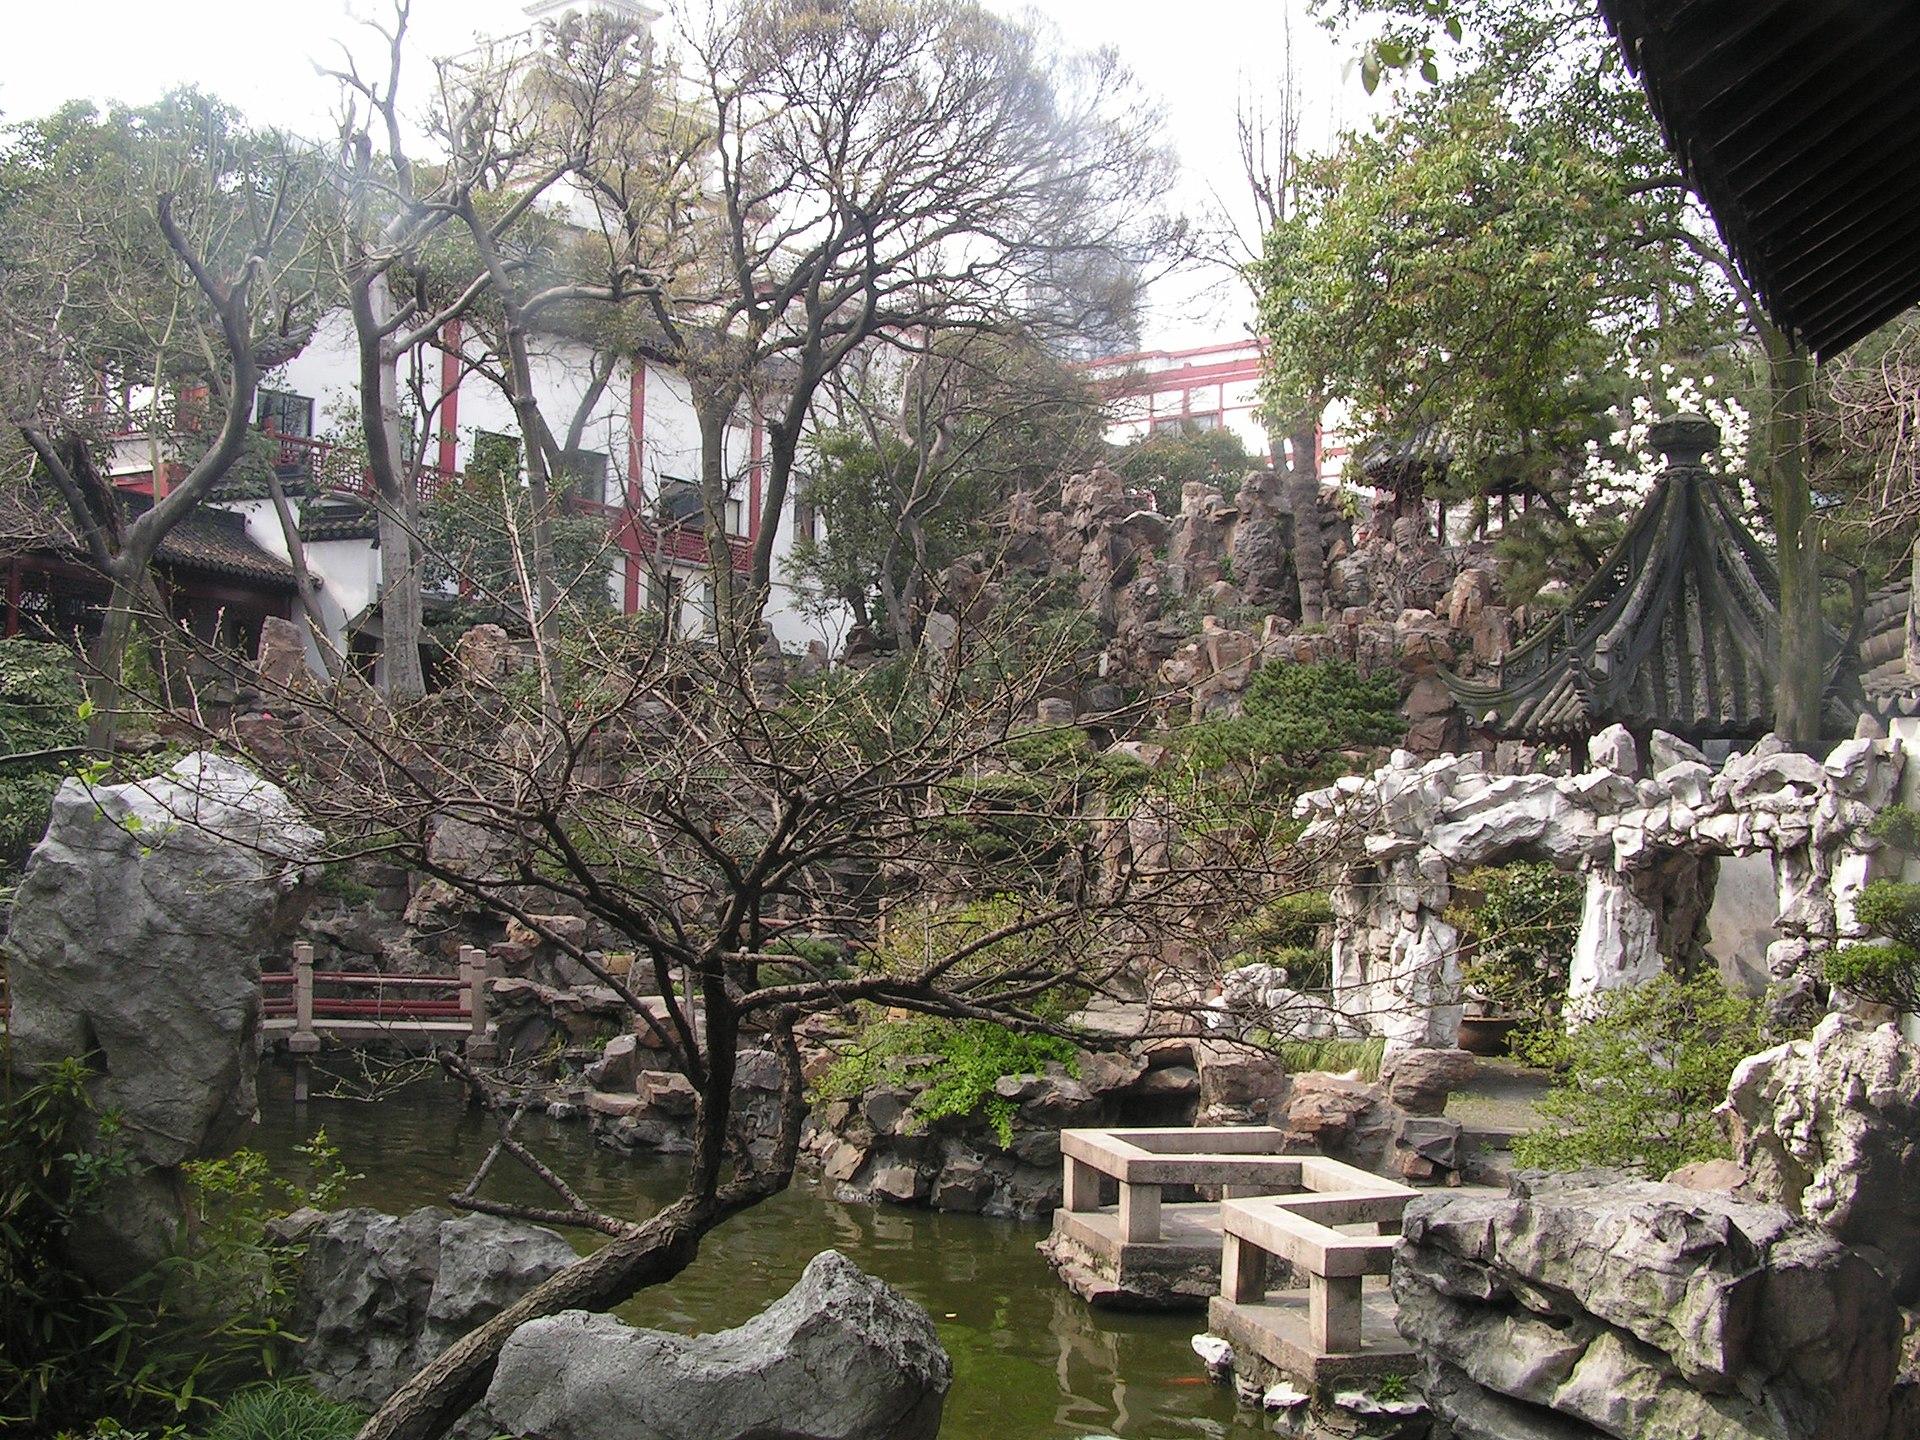 jard n chino wikipedia la enciclopedia libre On jardines wikipedia